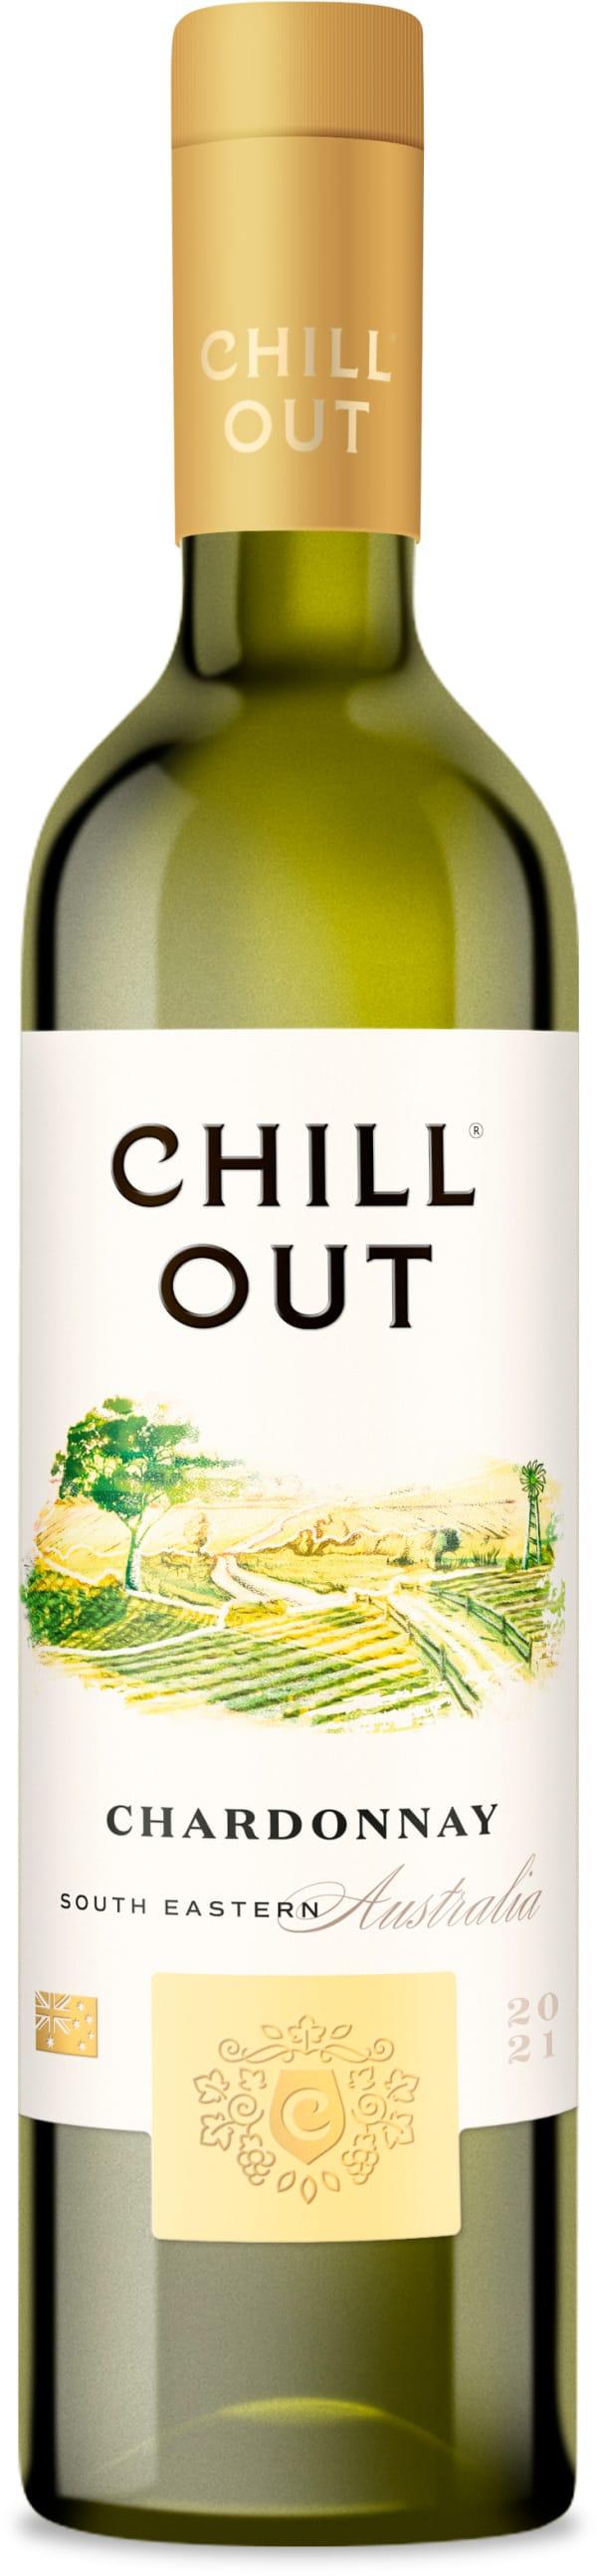 Chill Out Chardonnay Australia 2018 muovipullo